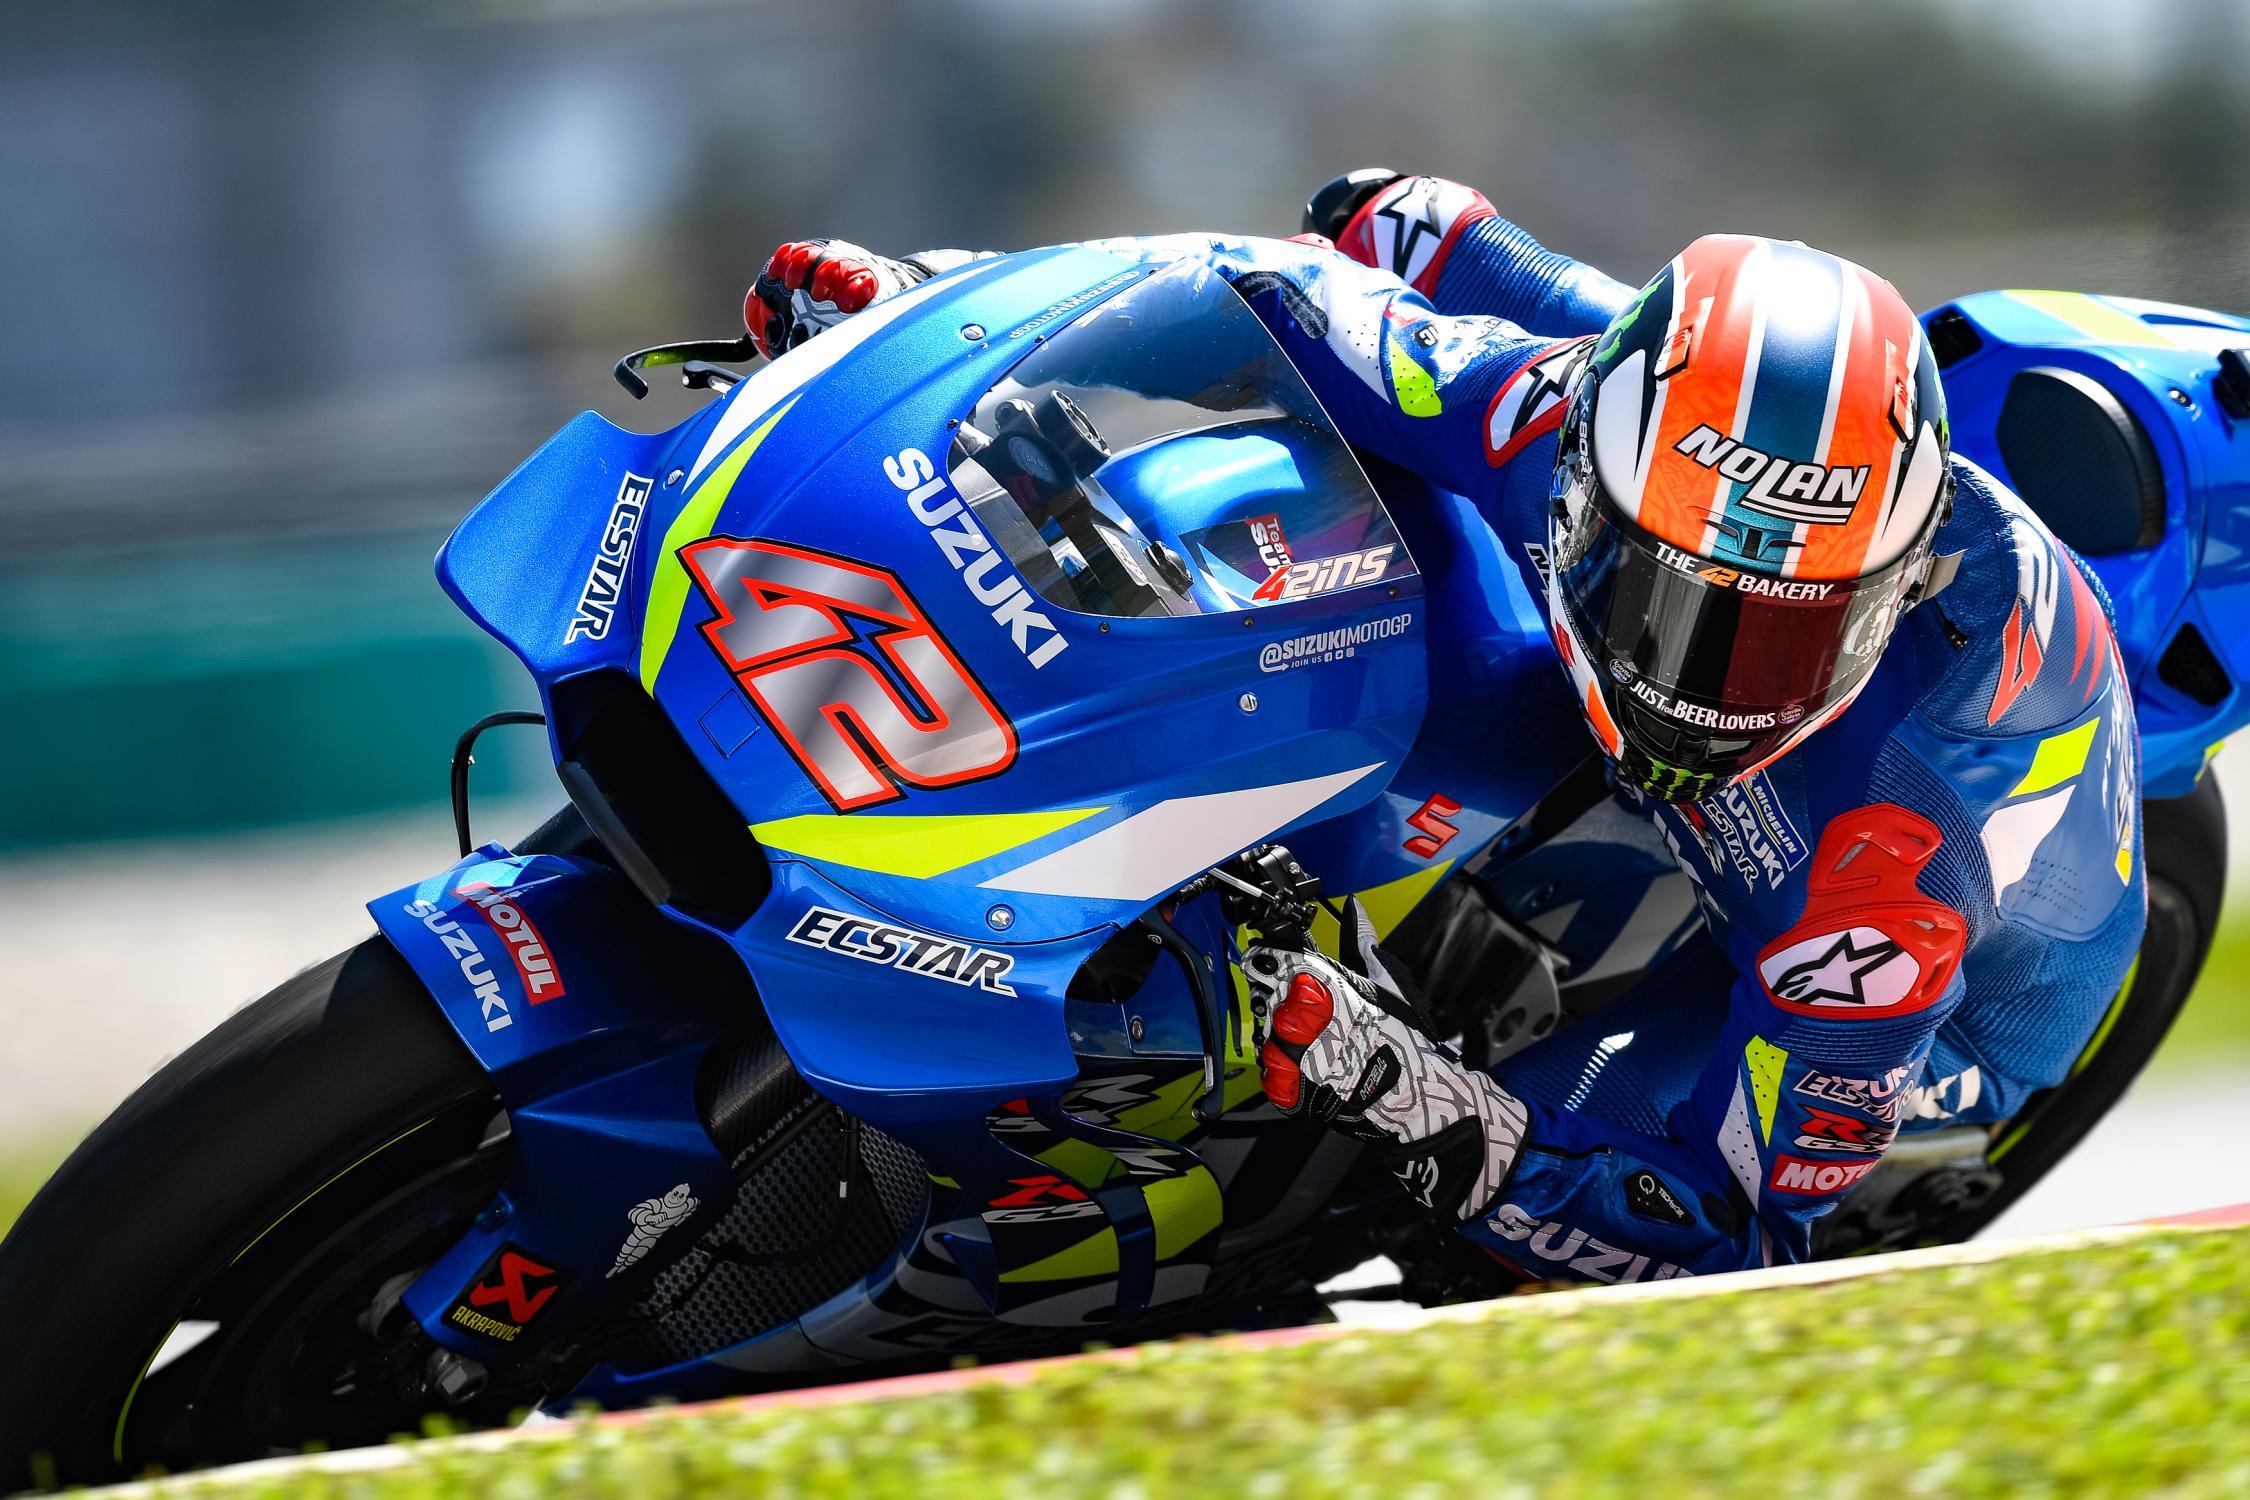 MOTO GP TESTS 2019 - Page 2 Alex-rins-sepang-test-j1-motogp-2019